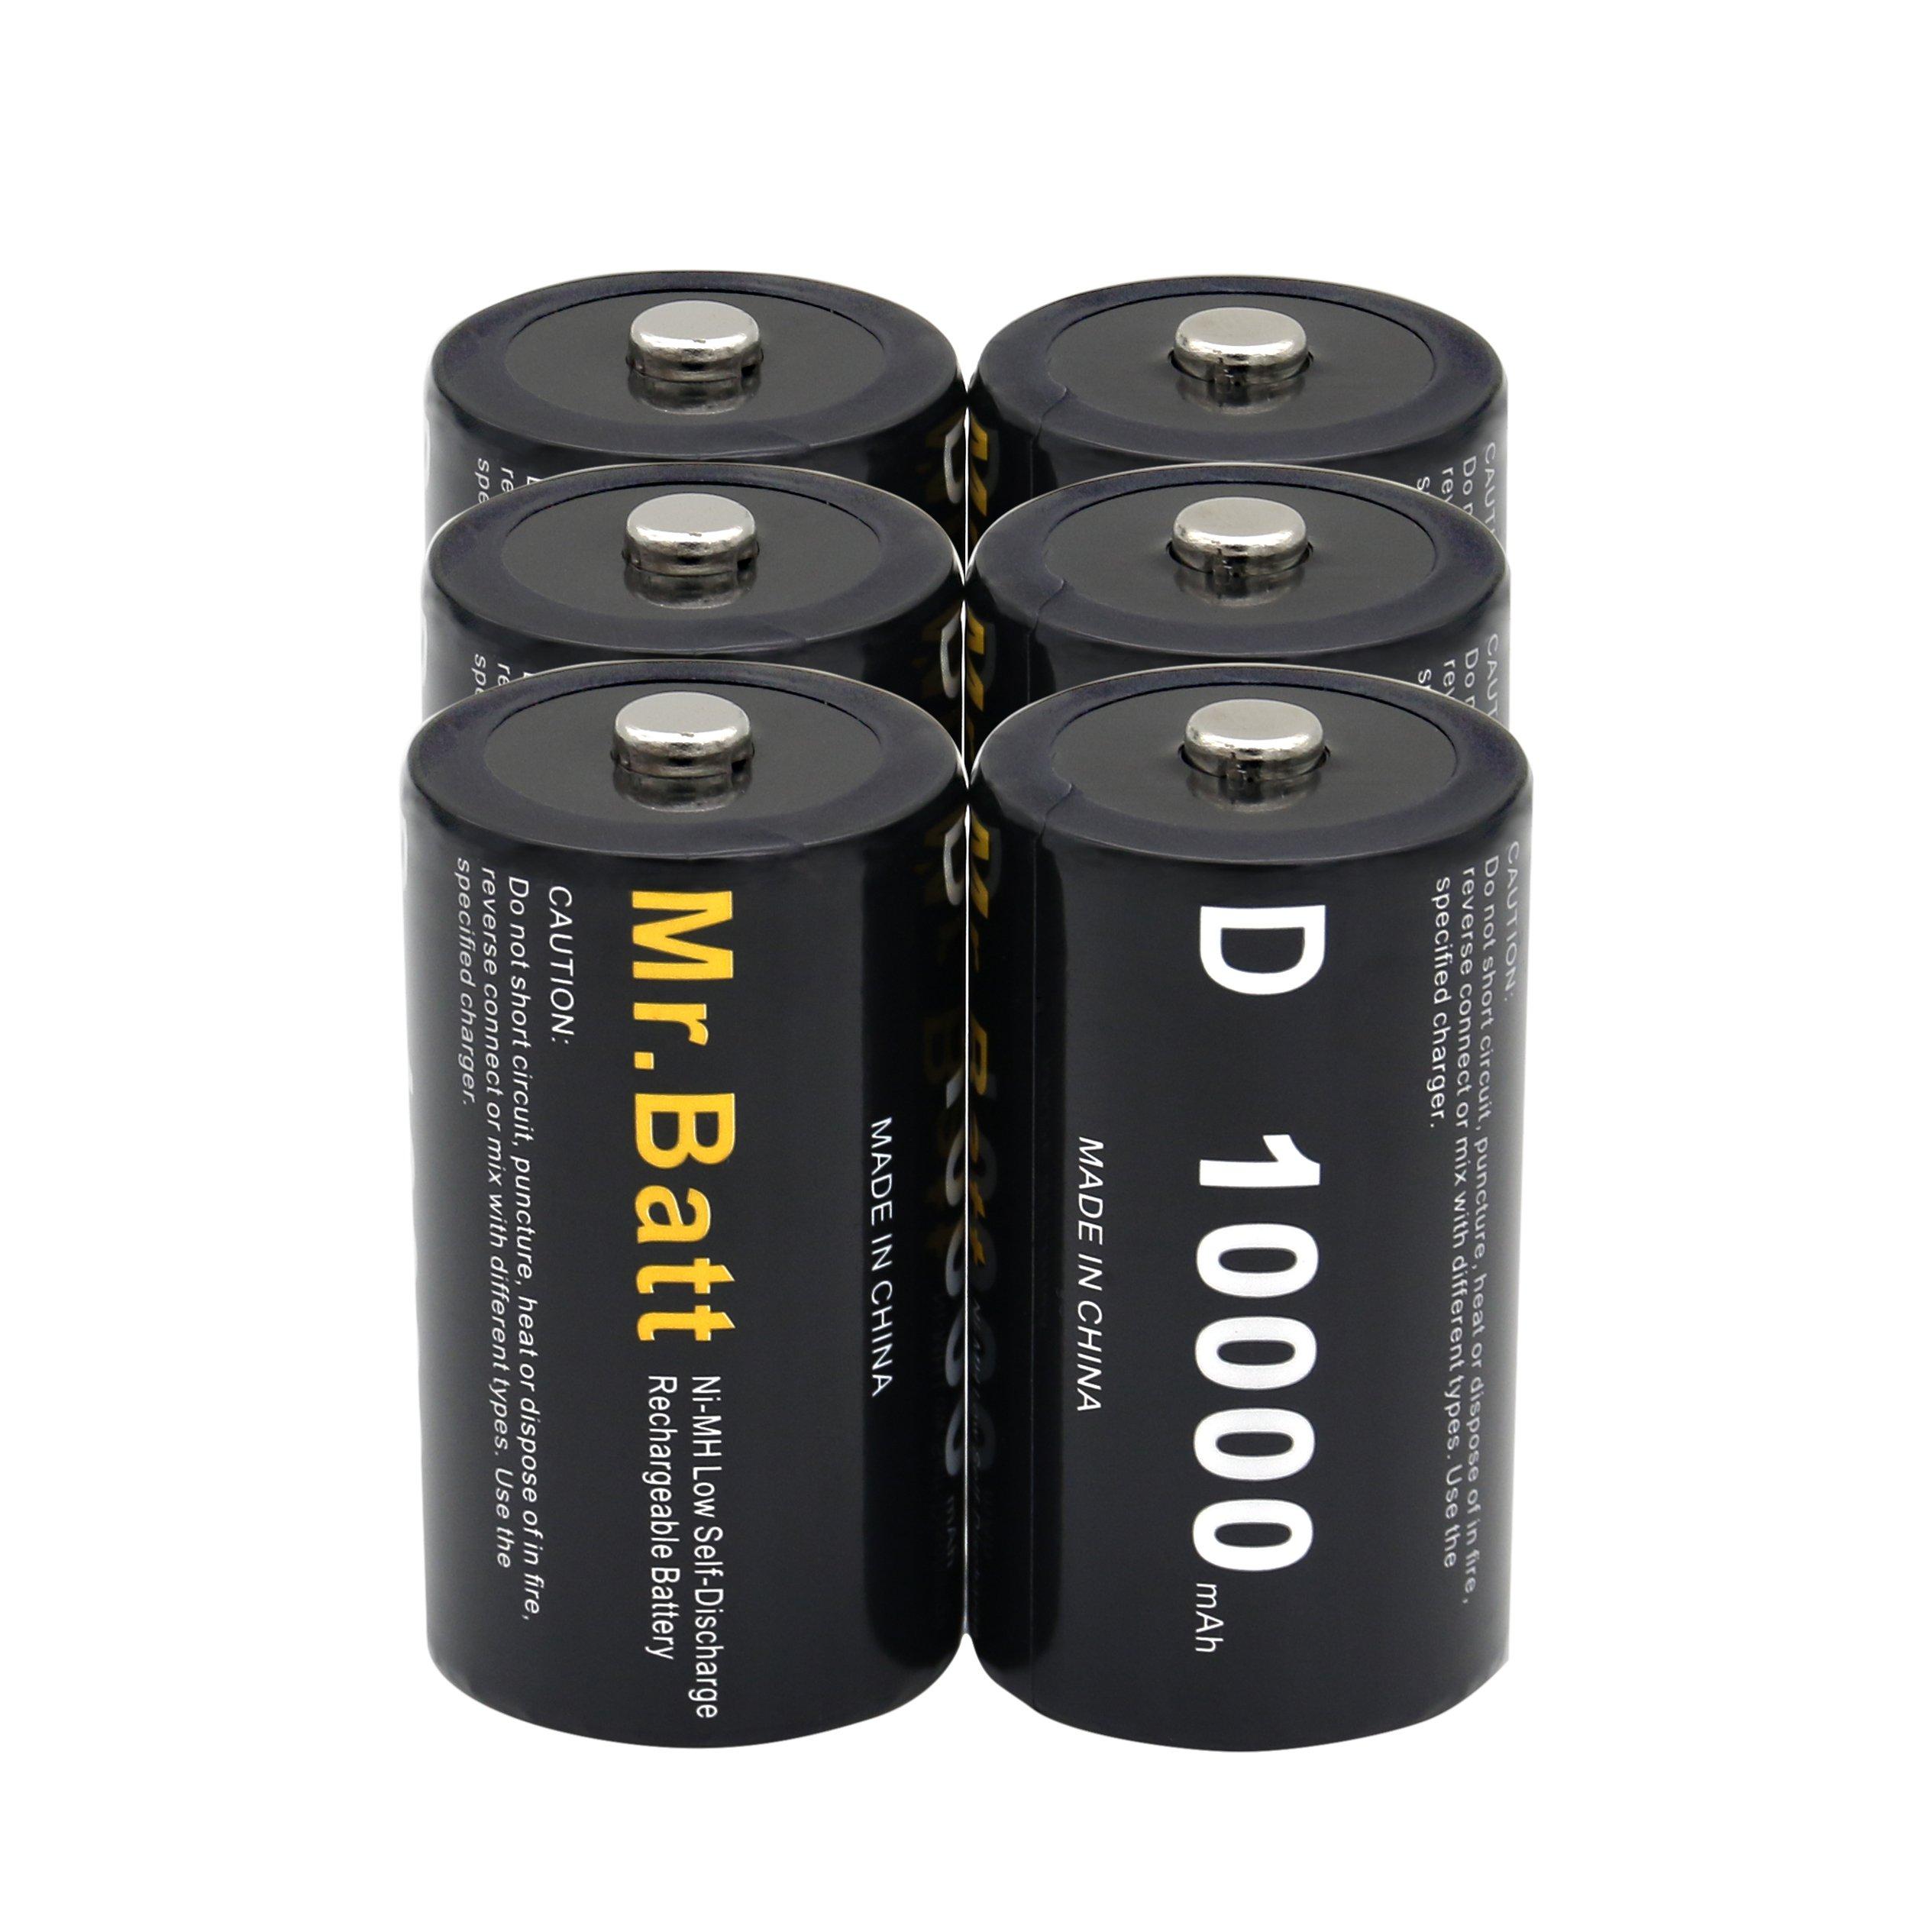 Mr.Batt NiMH Rechargeable D Batteries Low Self Discharge, 10000mAh (6 Pack)